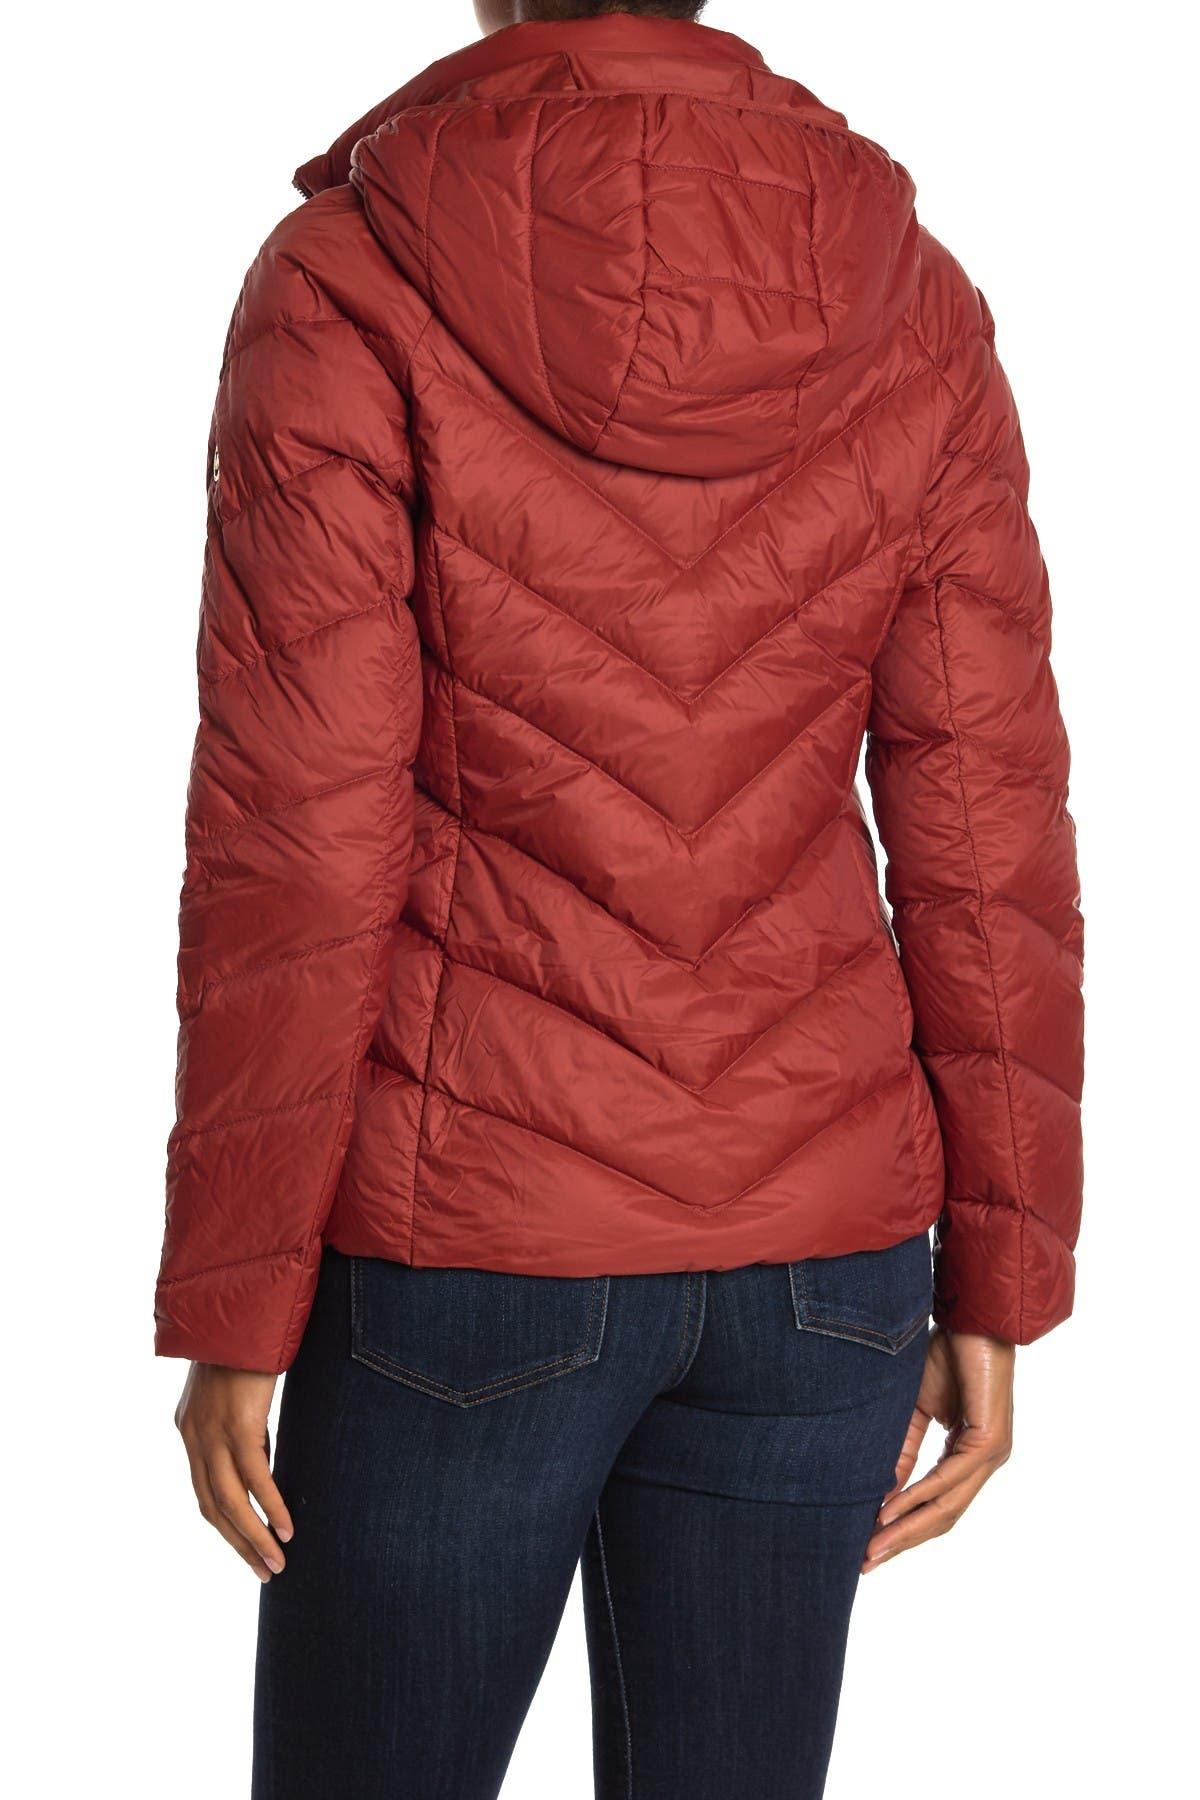 Image of Michael Kors Short Packable Puffer Jacket